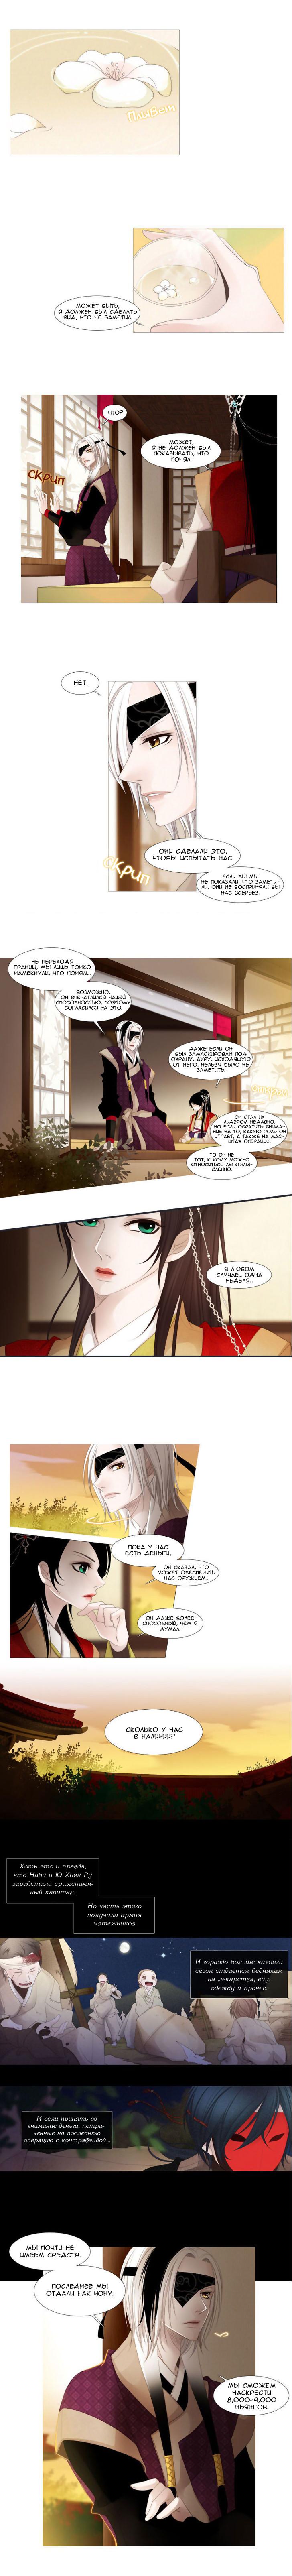 https://r1.ninemanga.com/comics/pic2/29/21469/211832/142796428790.jpg Page 1